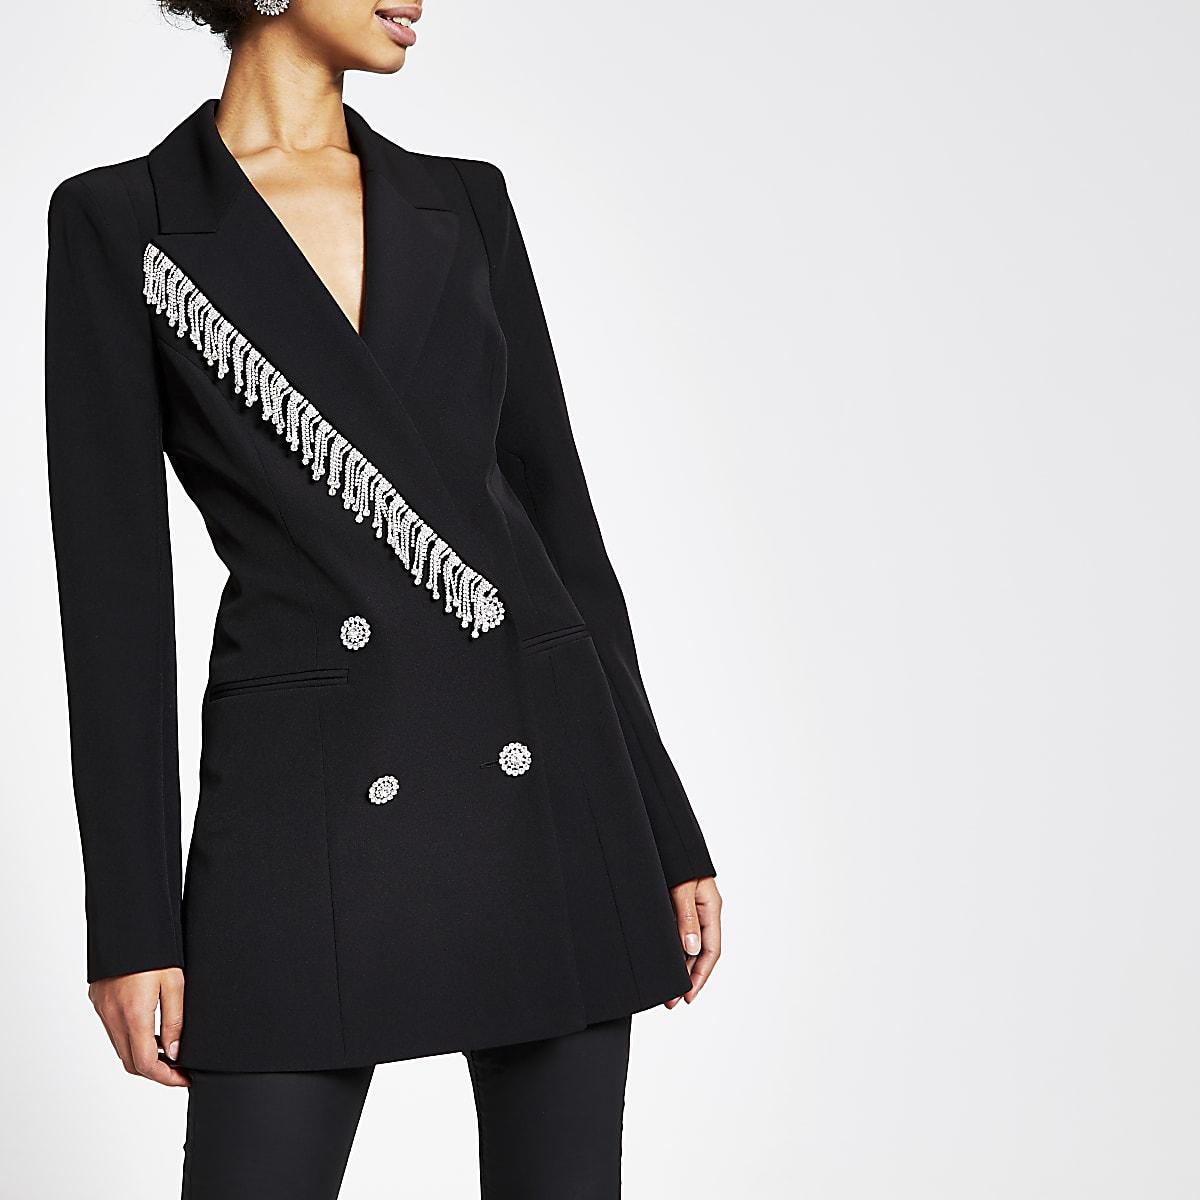 Black diamante fringe double breasted blazer